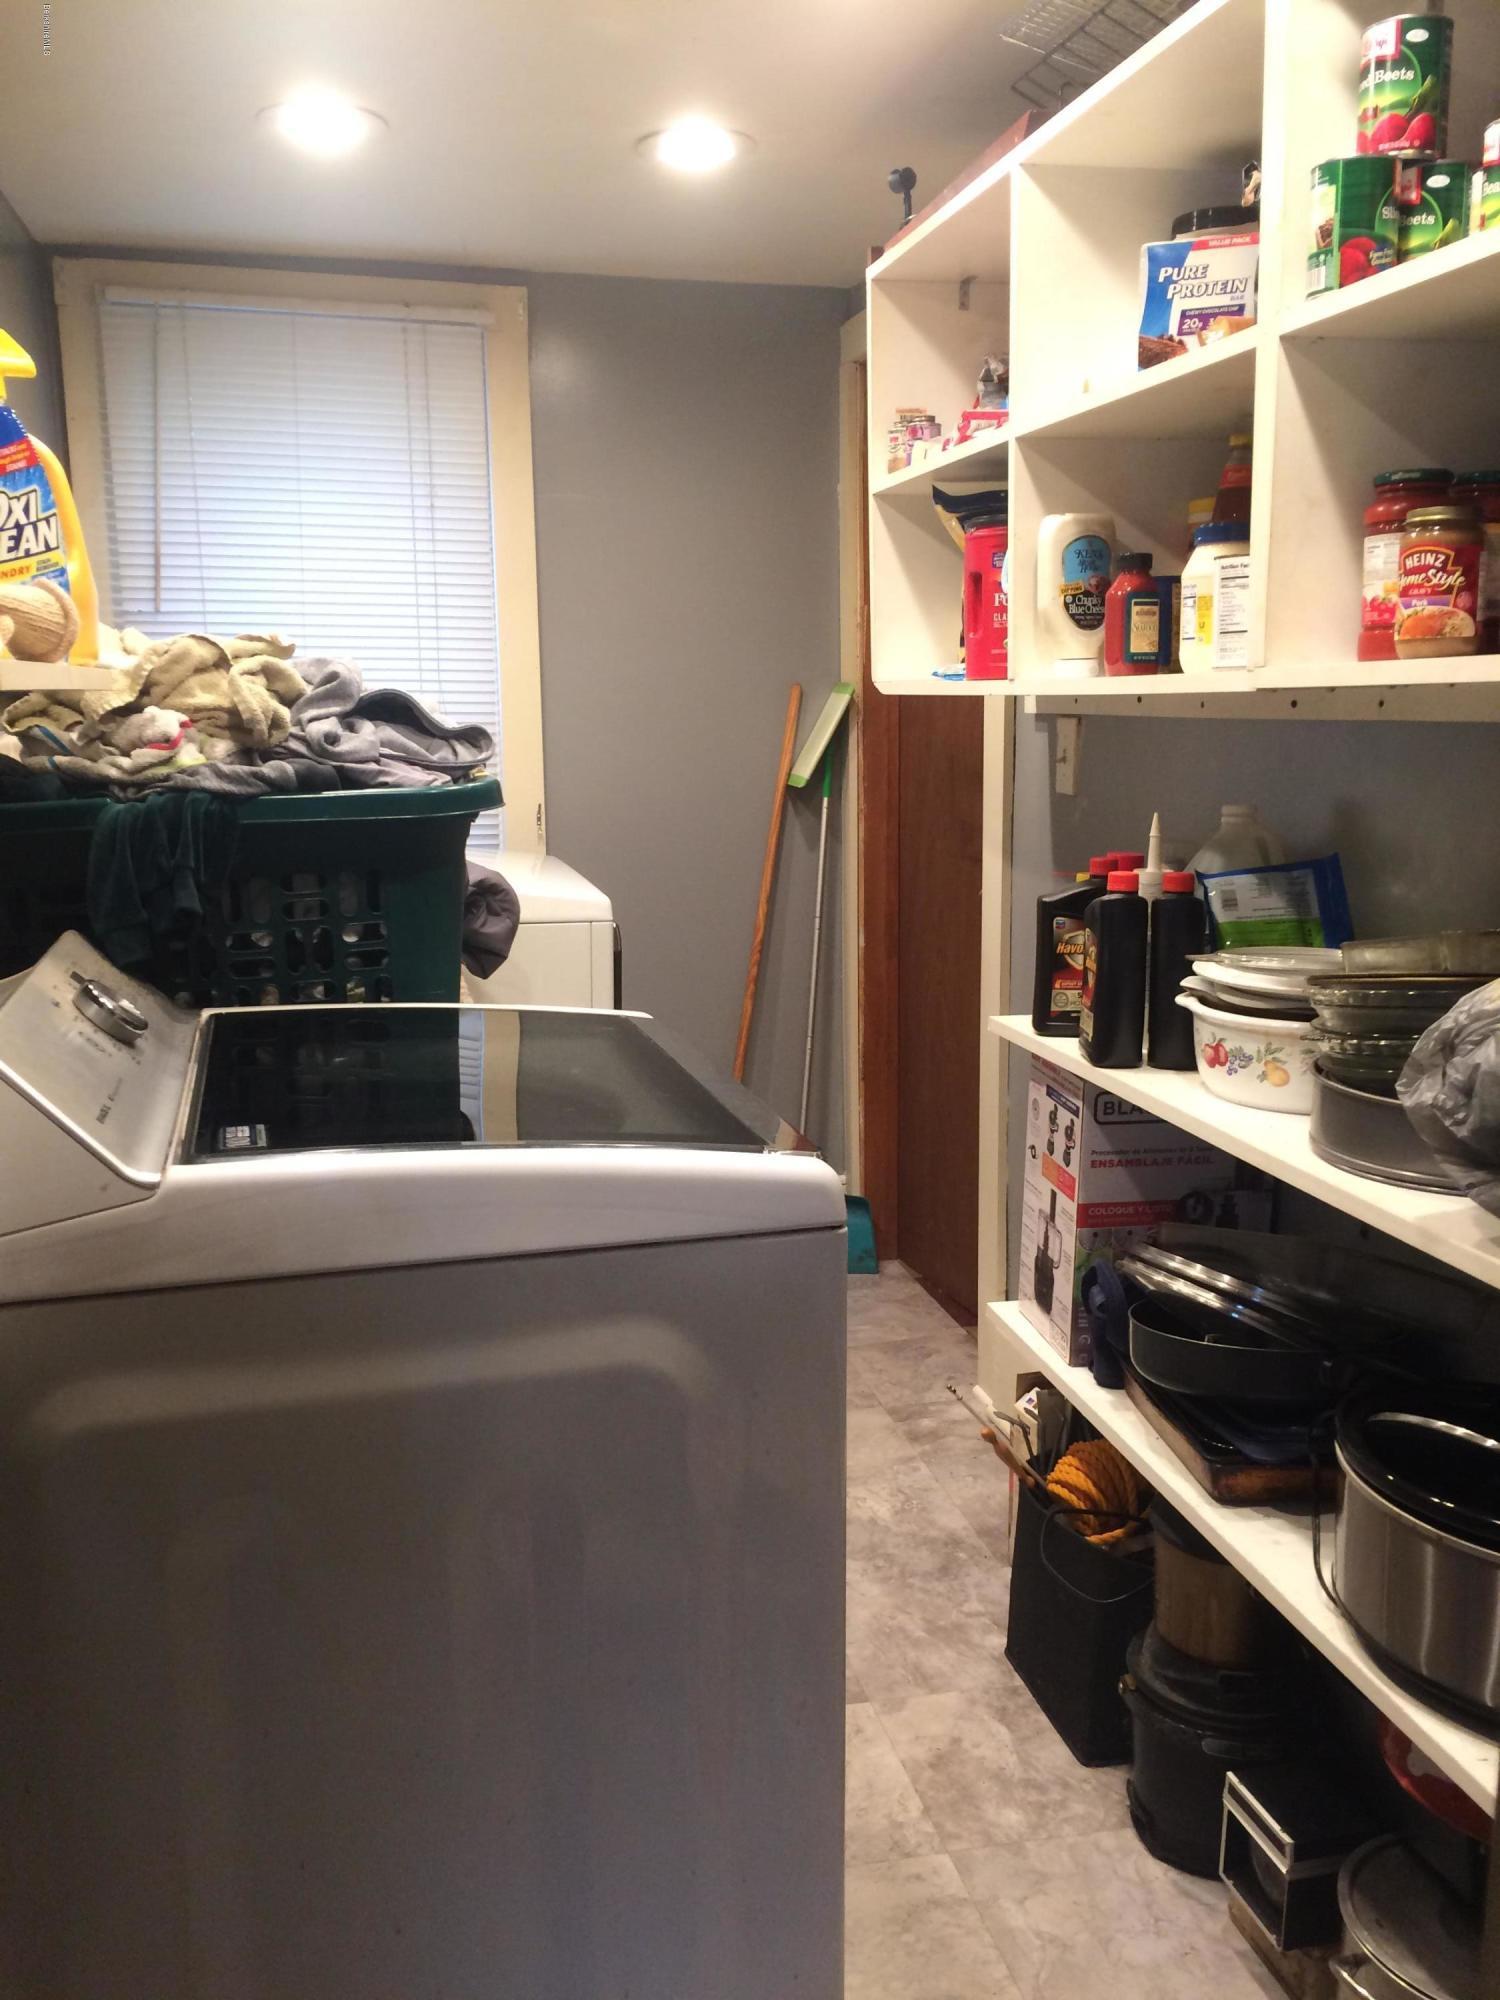 1st floor laundry room & pantry